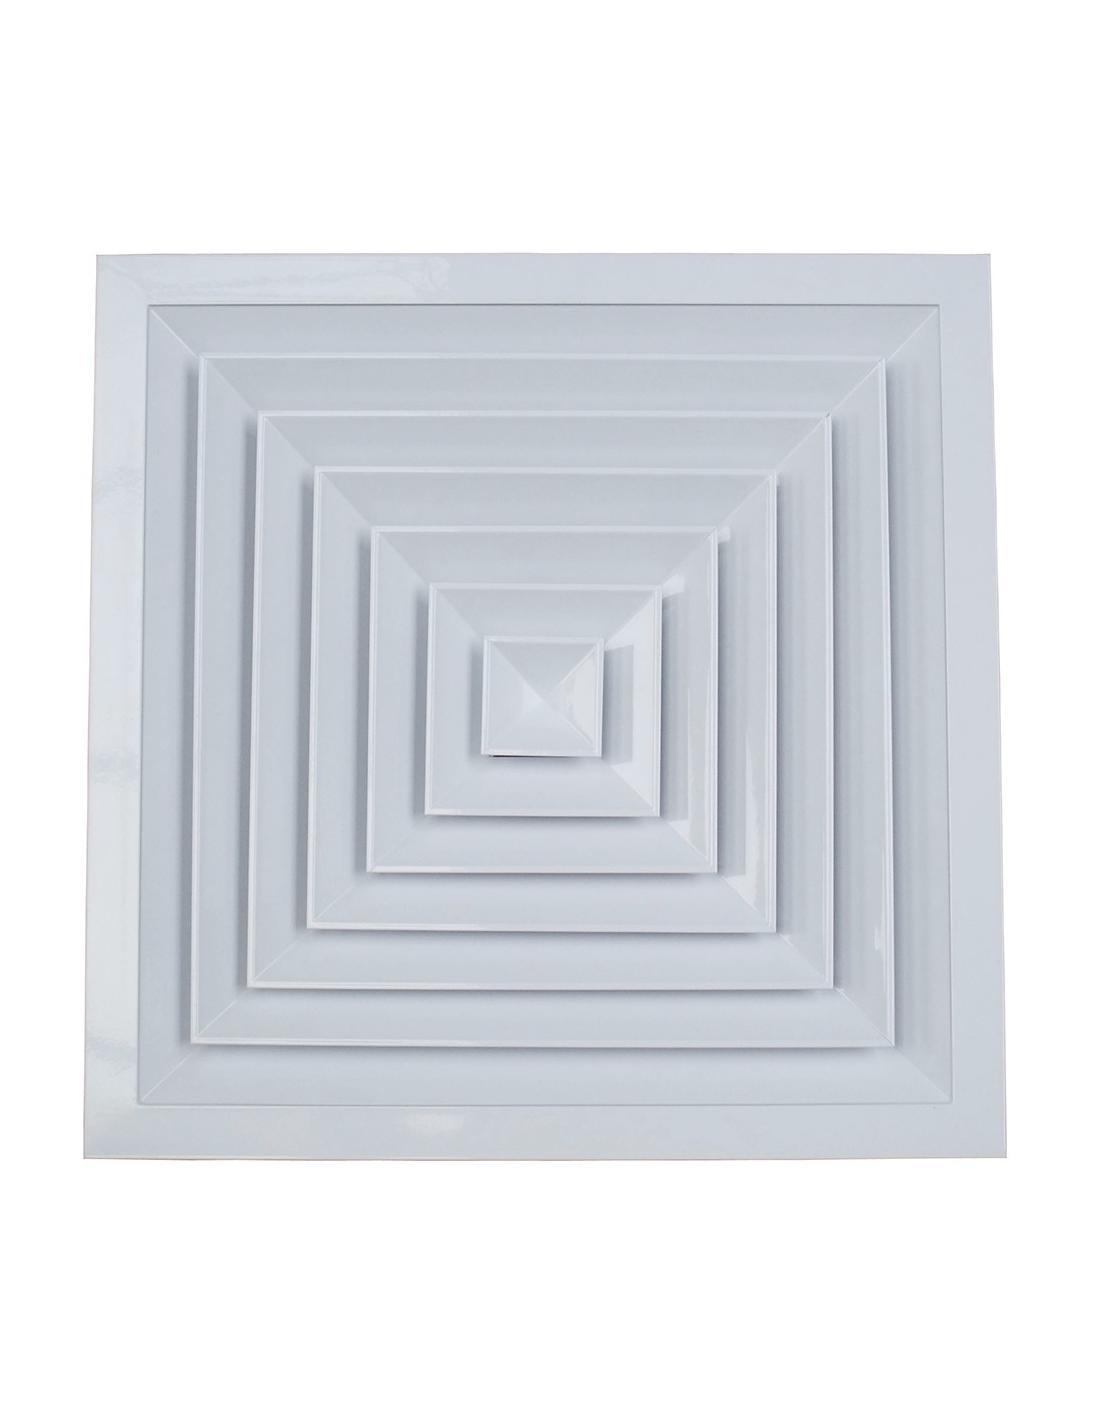 Diffuseur de plafond carré - 1